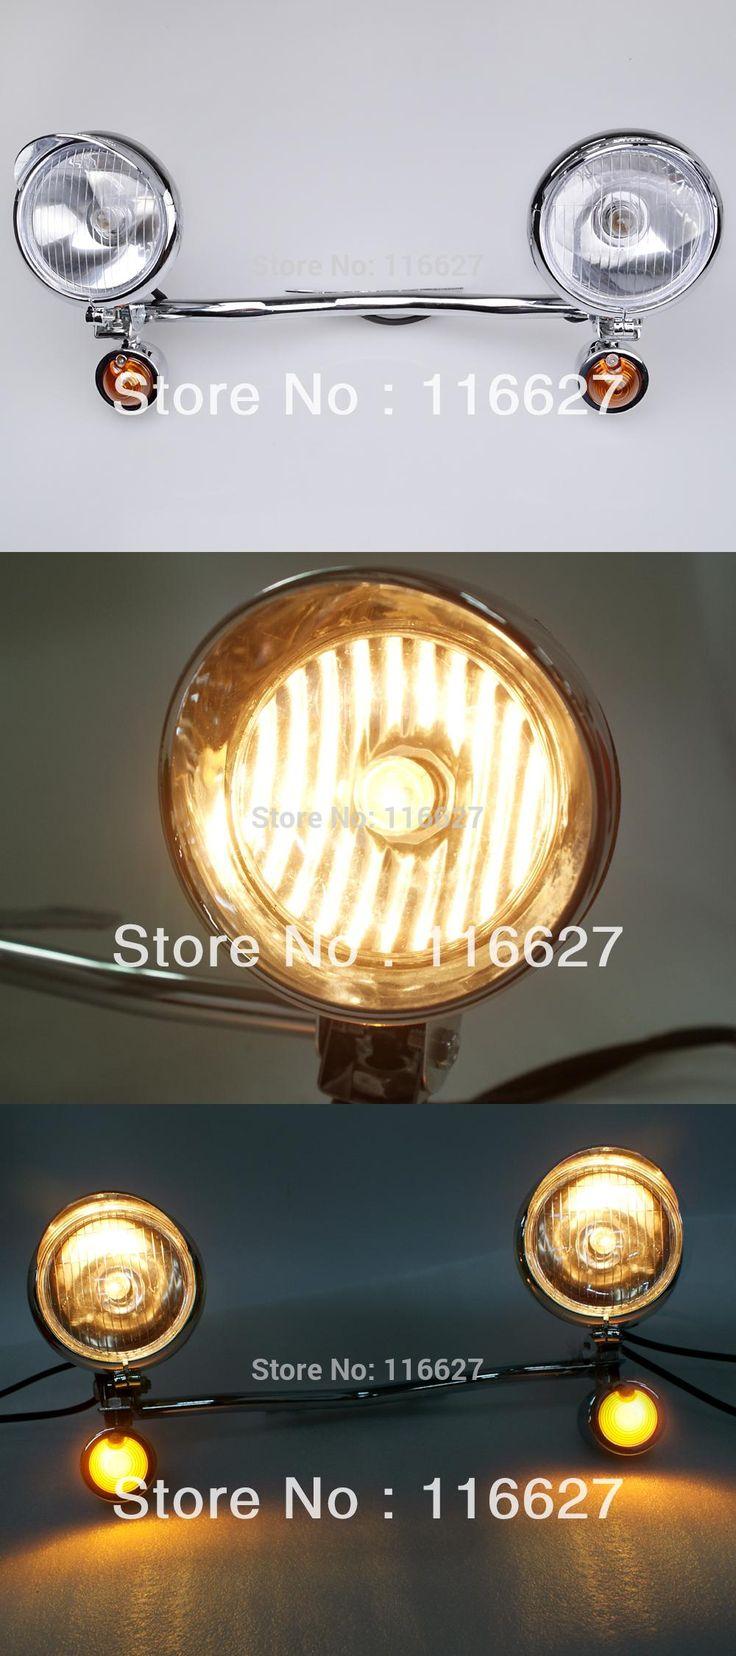 [Visit to Buy] Driving Passing Amber Turn Signal Spot Light Bar for Kawasaki VN Vulcan Classic  Honda Rebel Shadow VTX GL #Advertisement